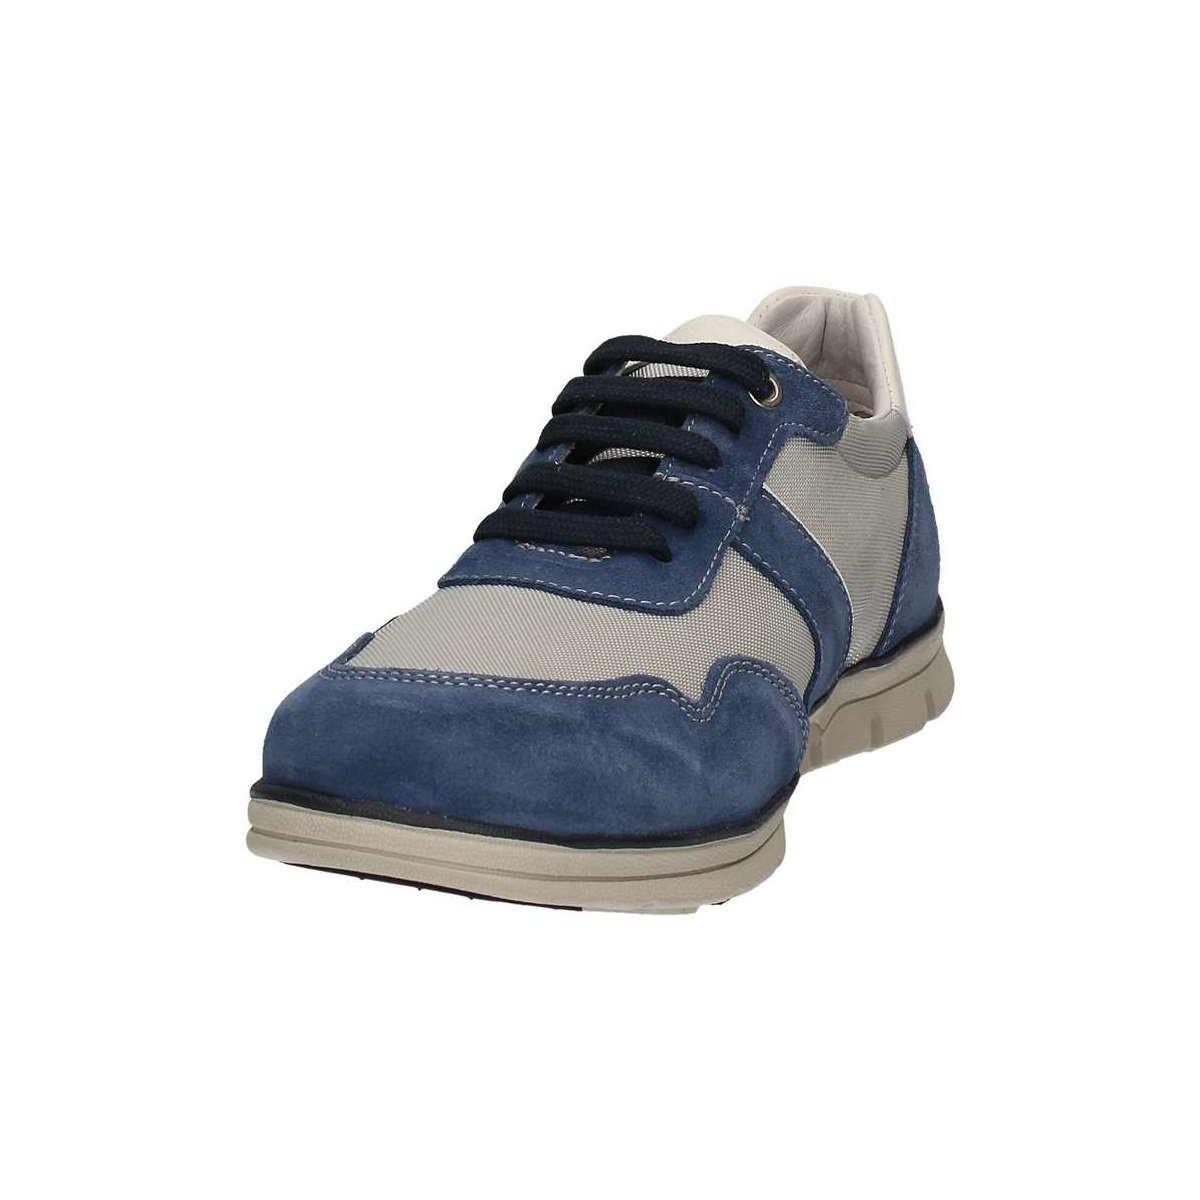 Keys 3071 Sneakers Man Blue Men's Shoes (trainers) In Blue for Men